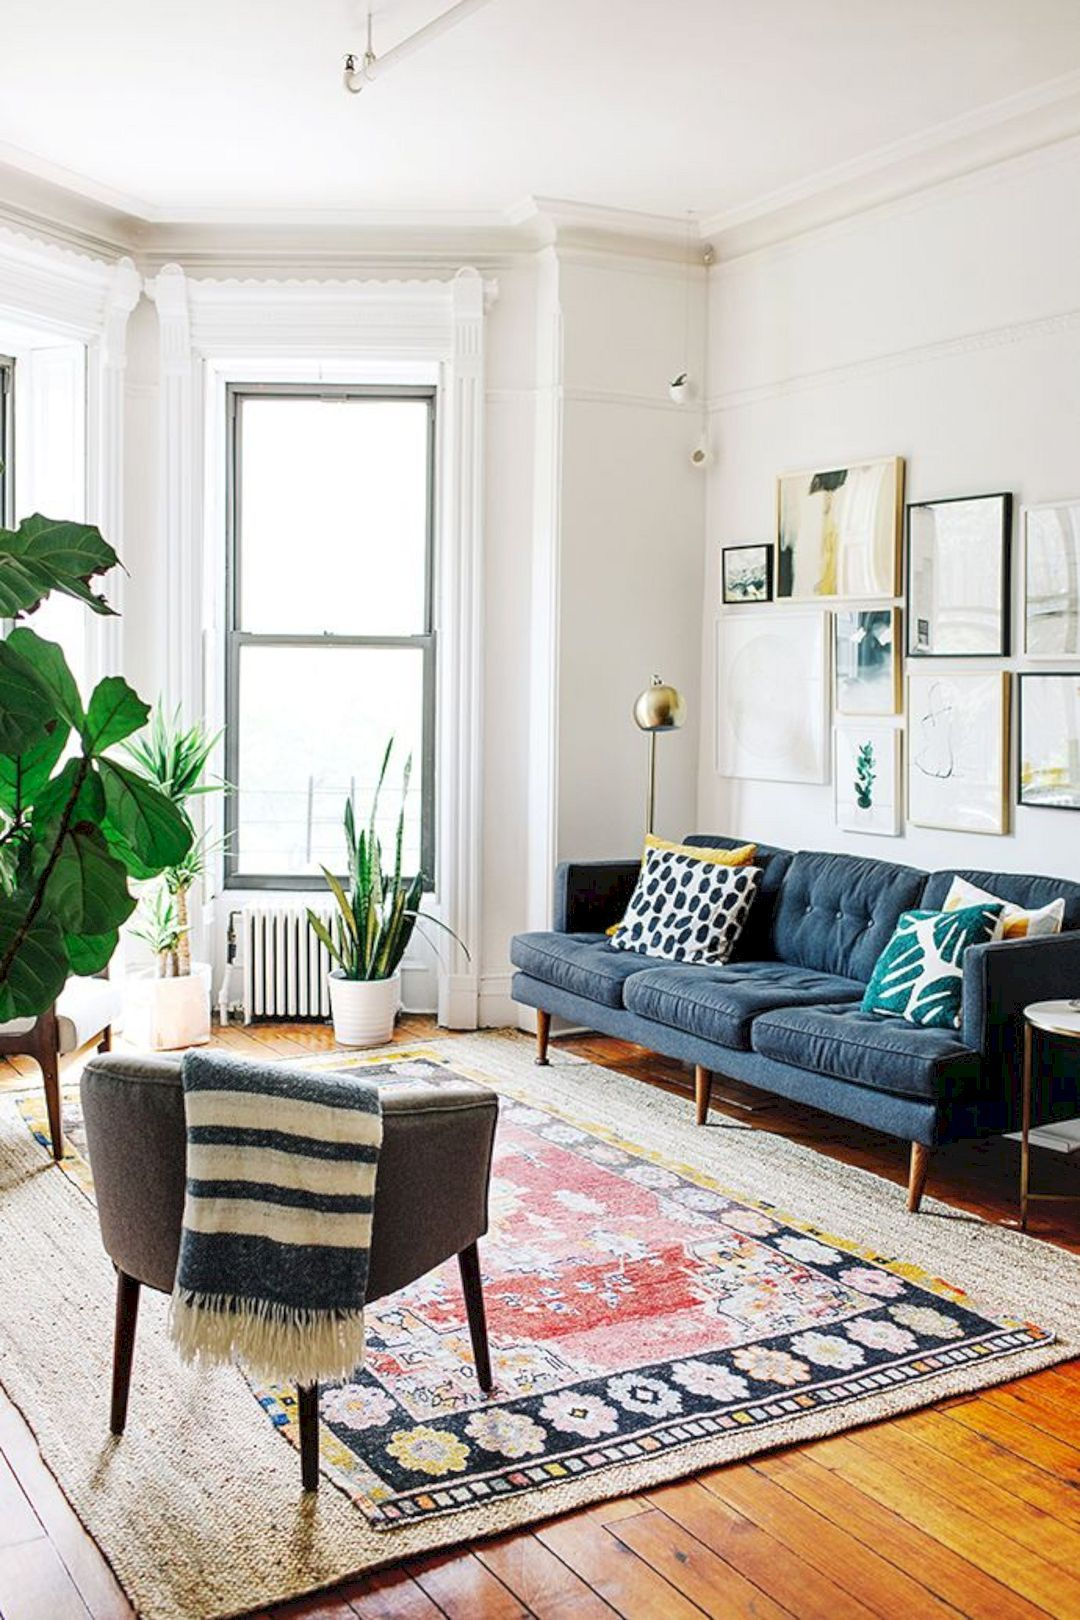 20 stunning small living room decorating ideas living room